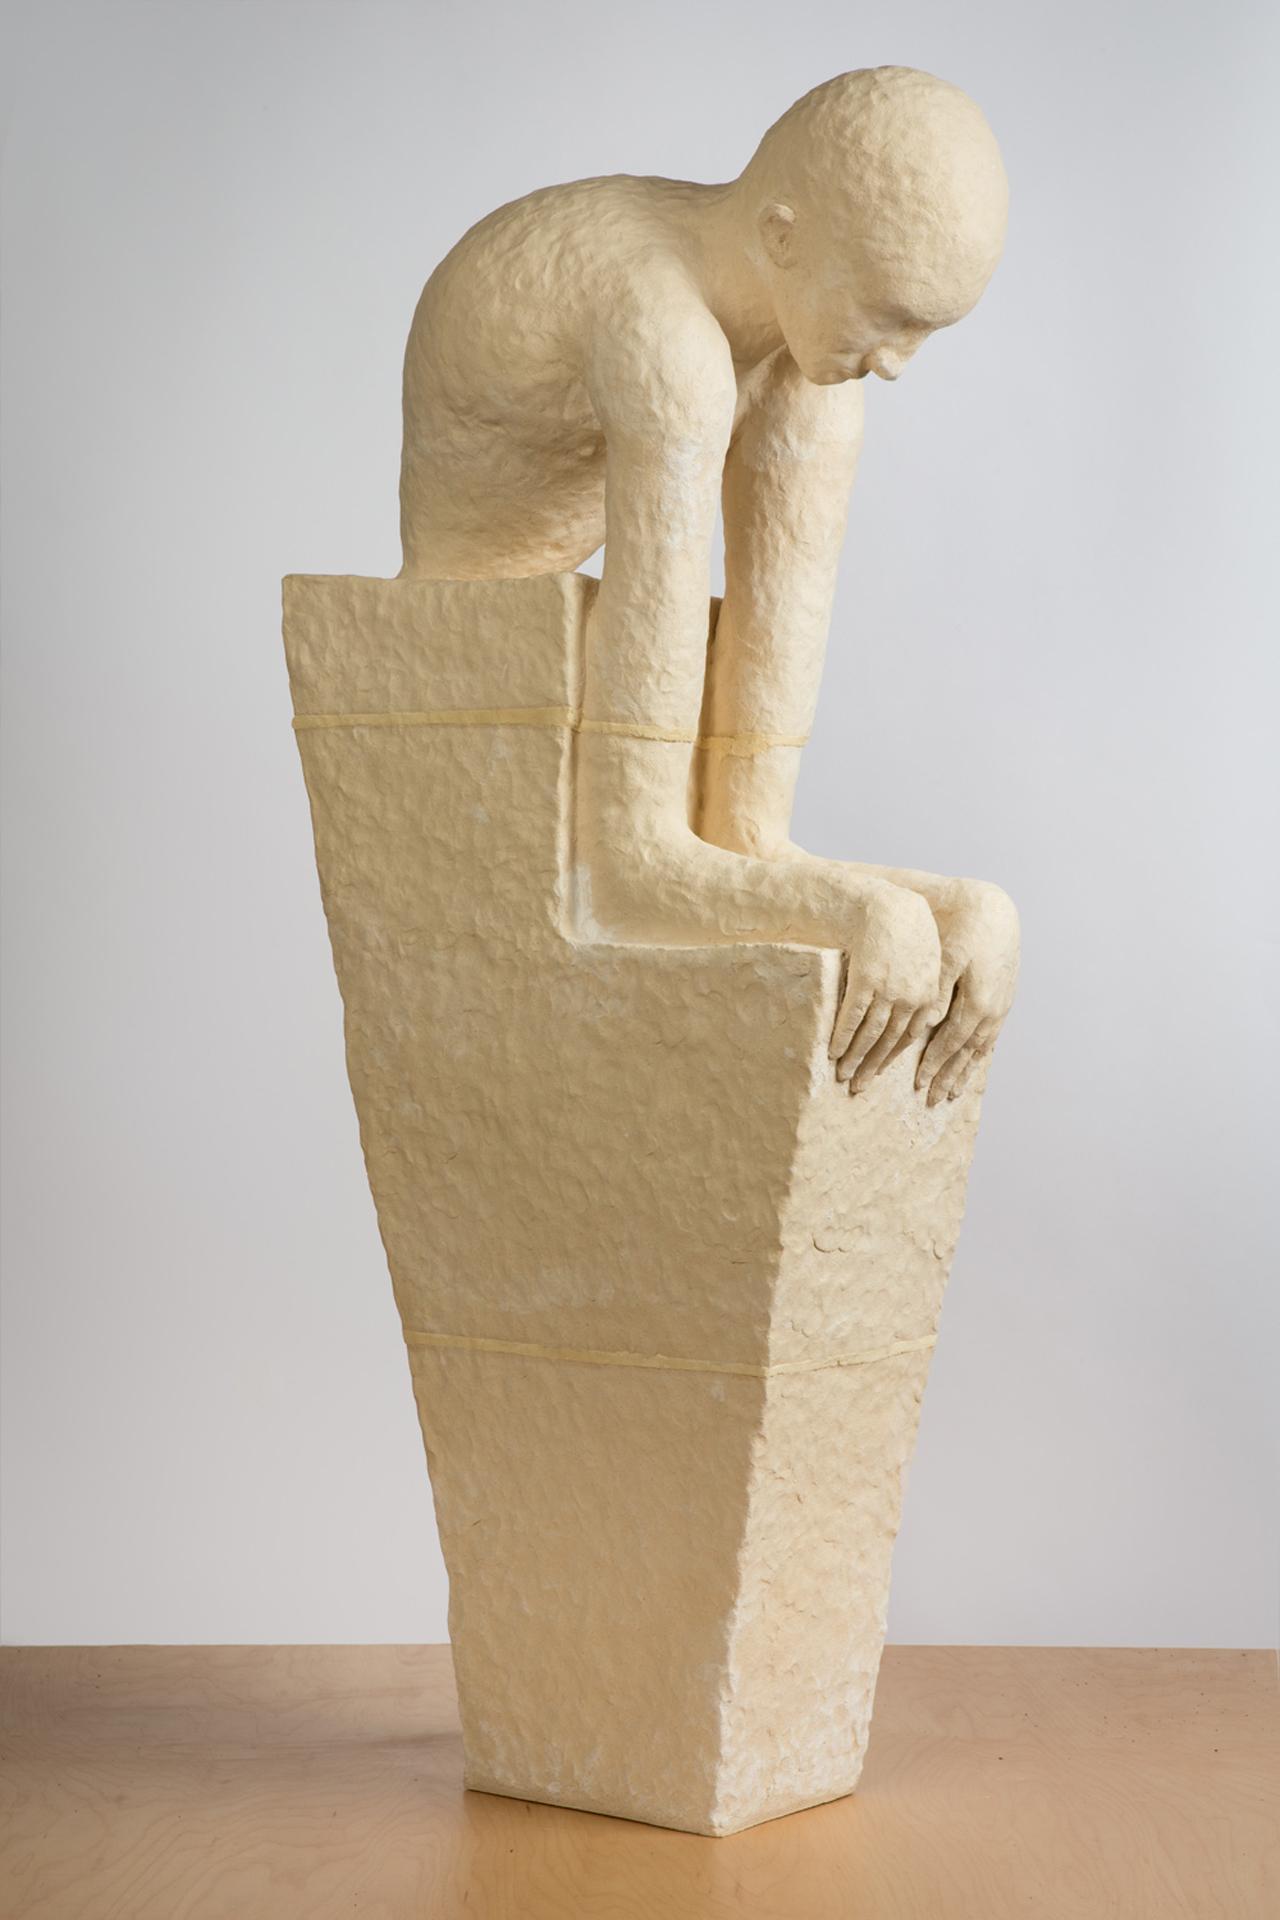 Ledge Figure